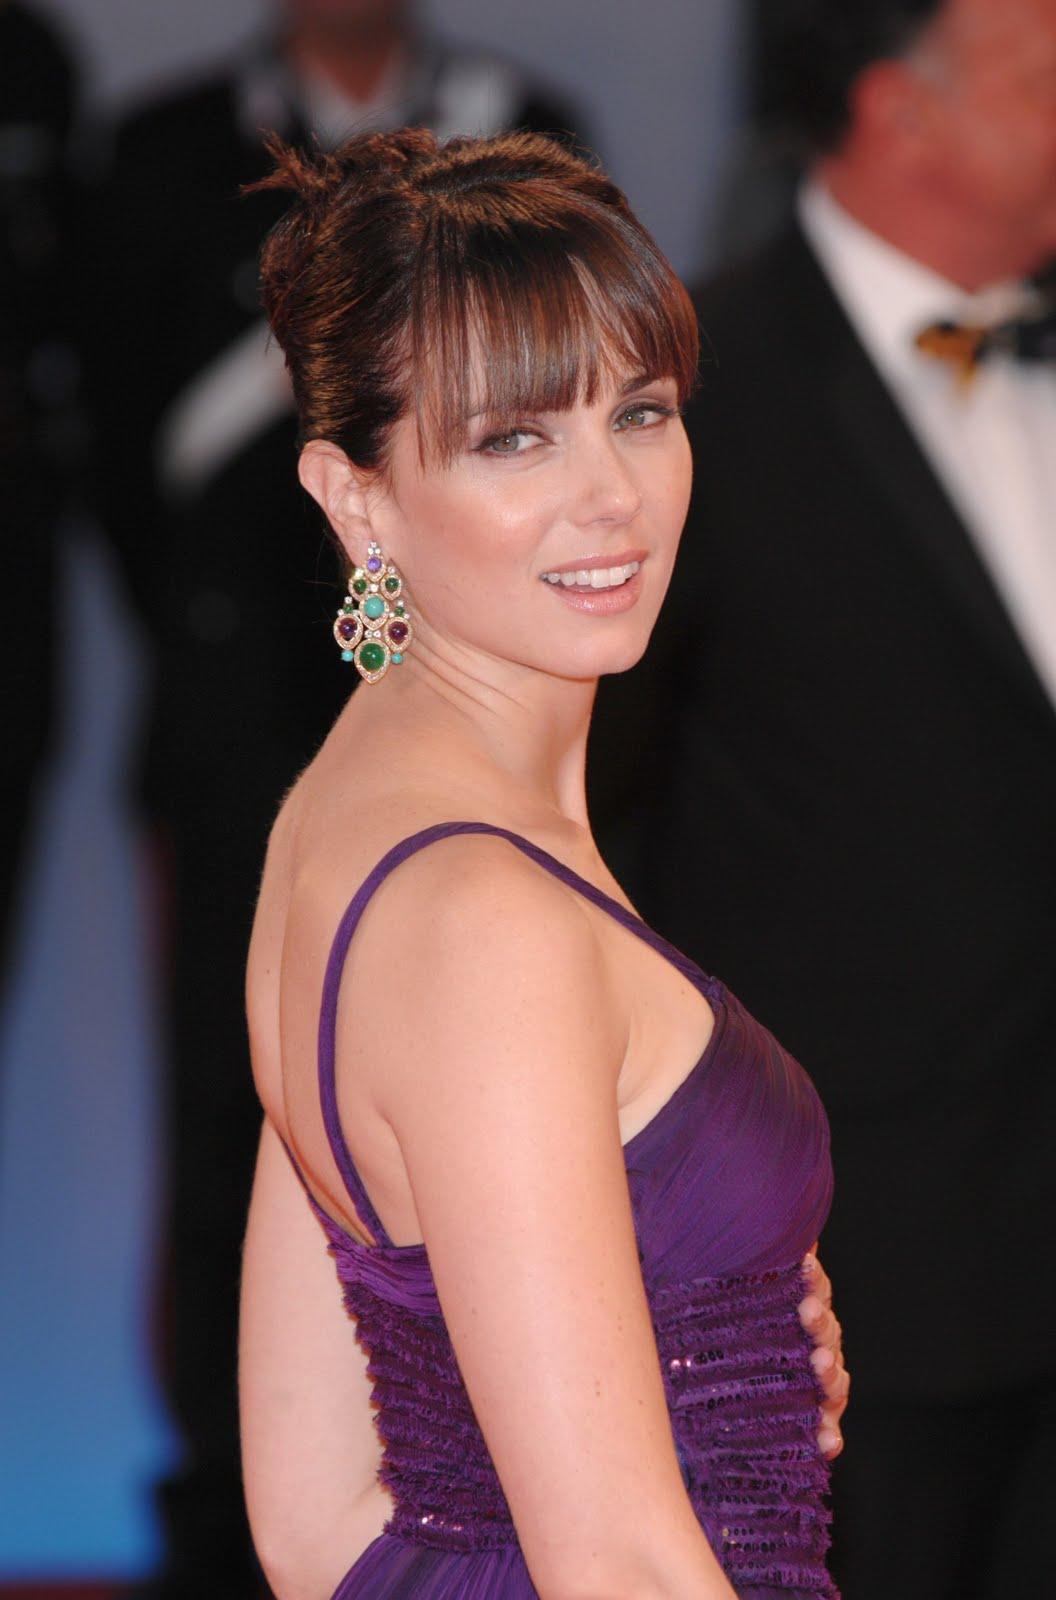 Femceleb Portraits] Actress: Mia Kirshner